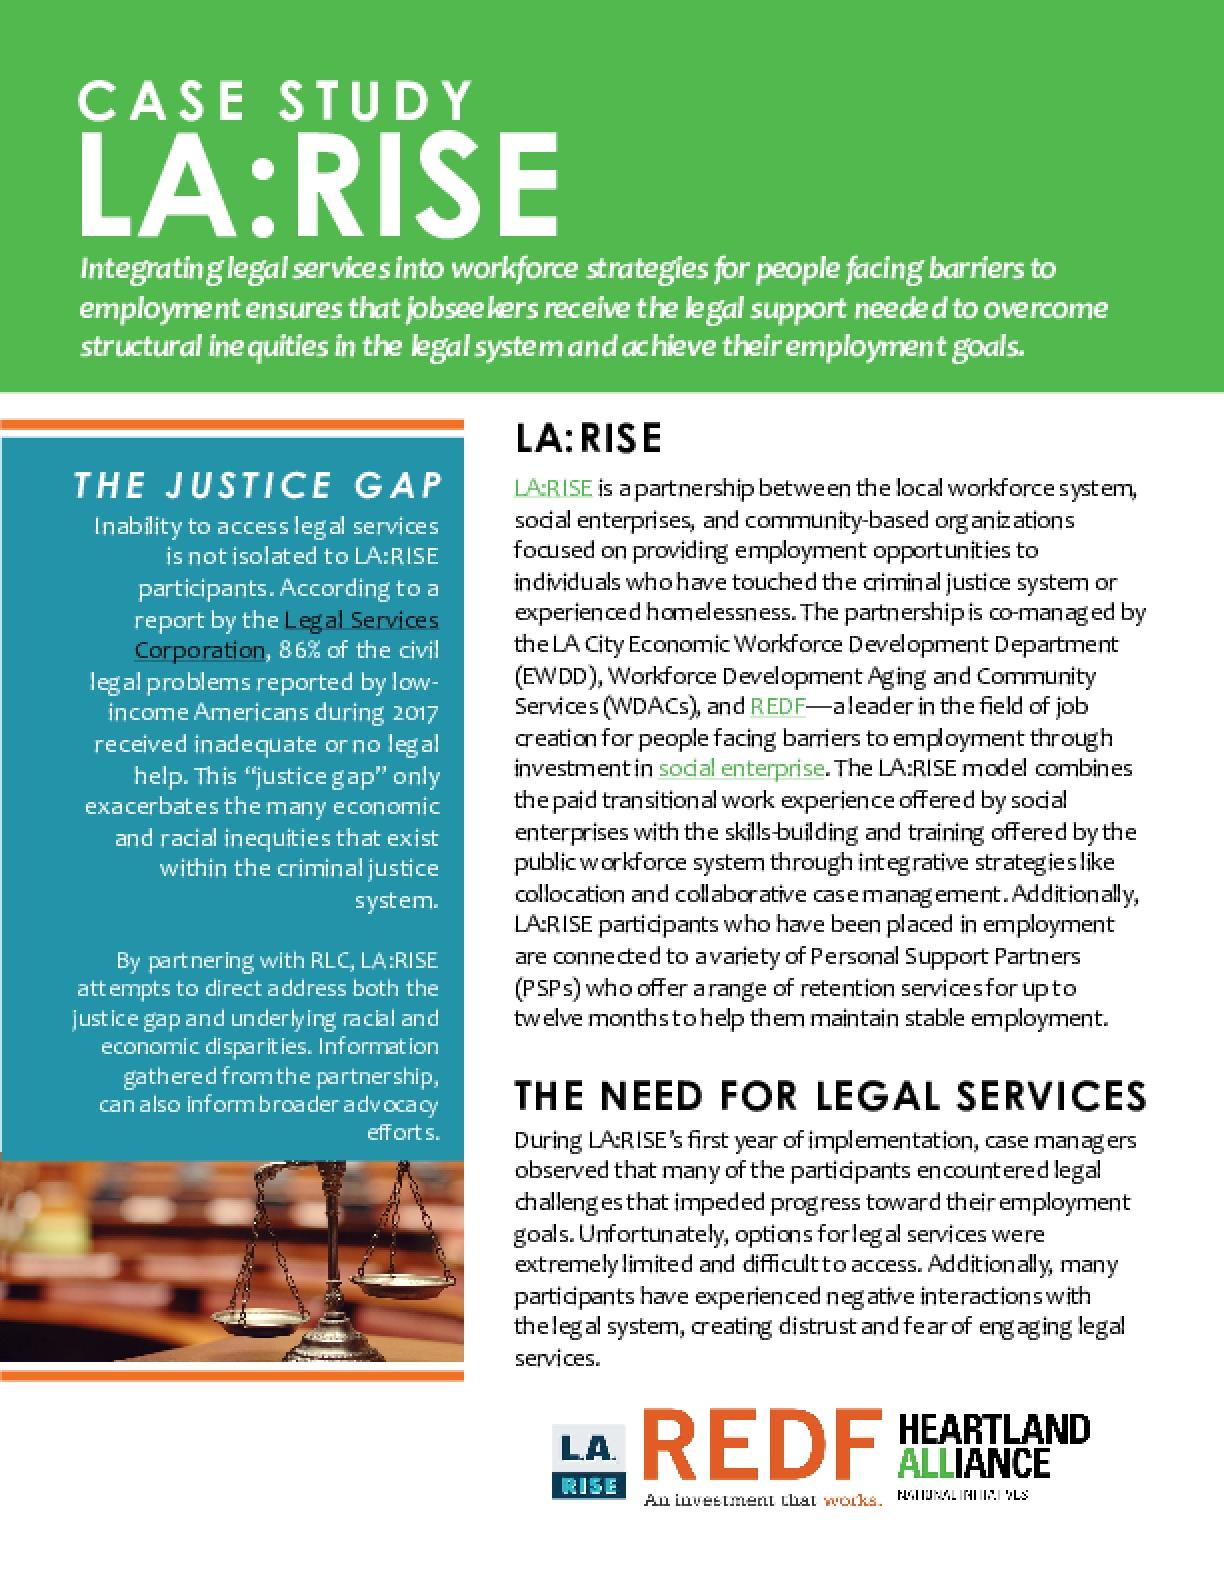 Case Study - LA:RISE